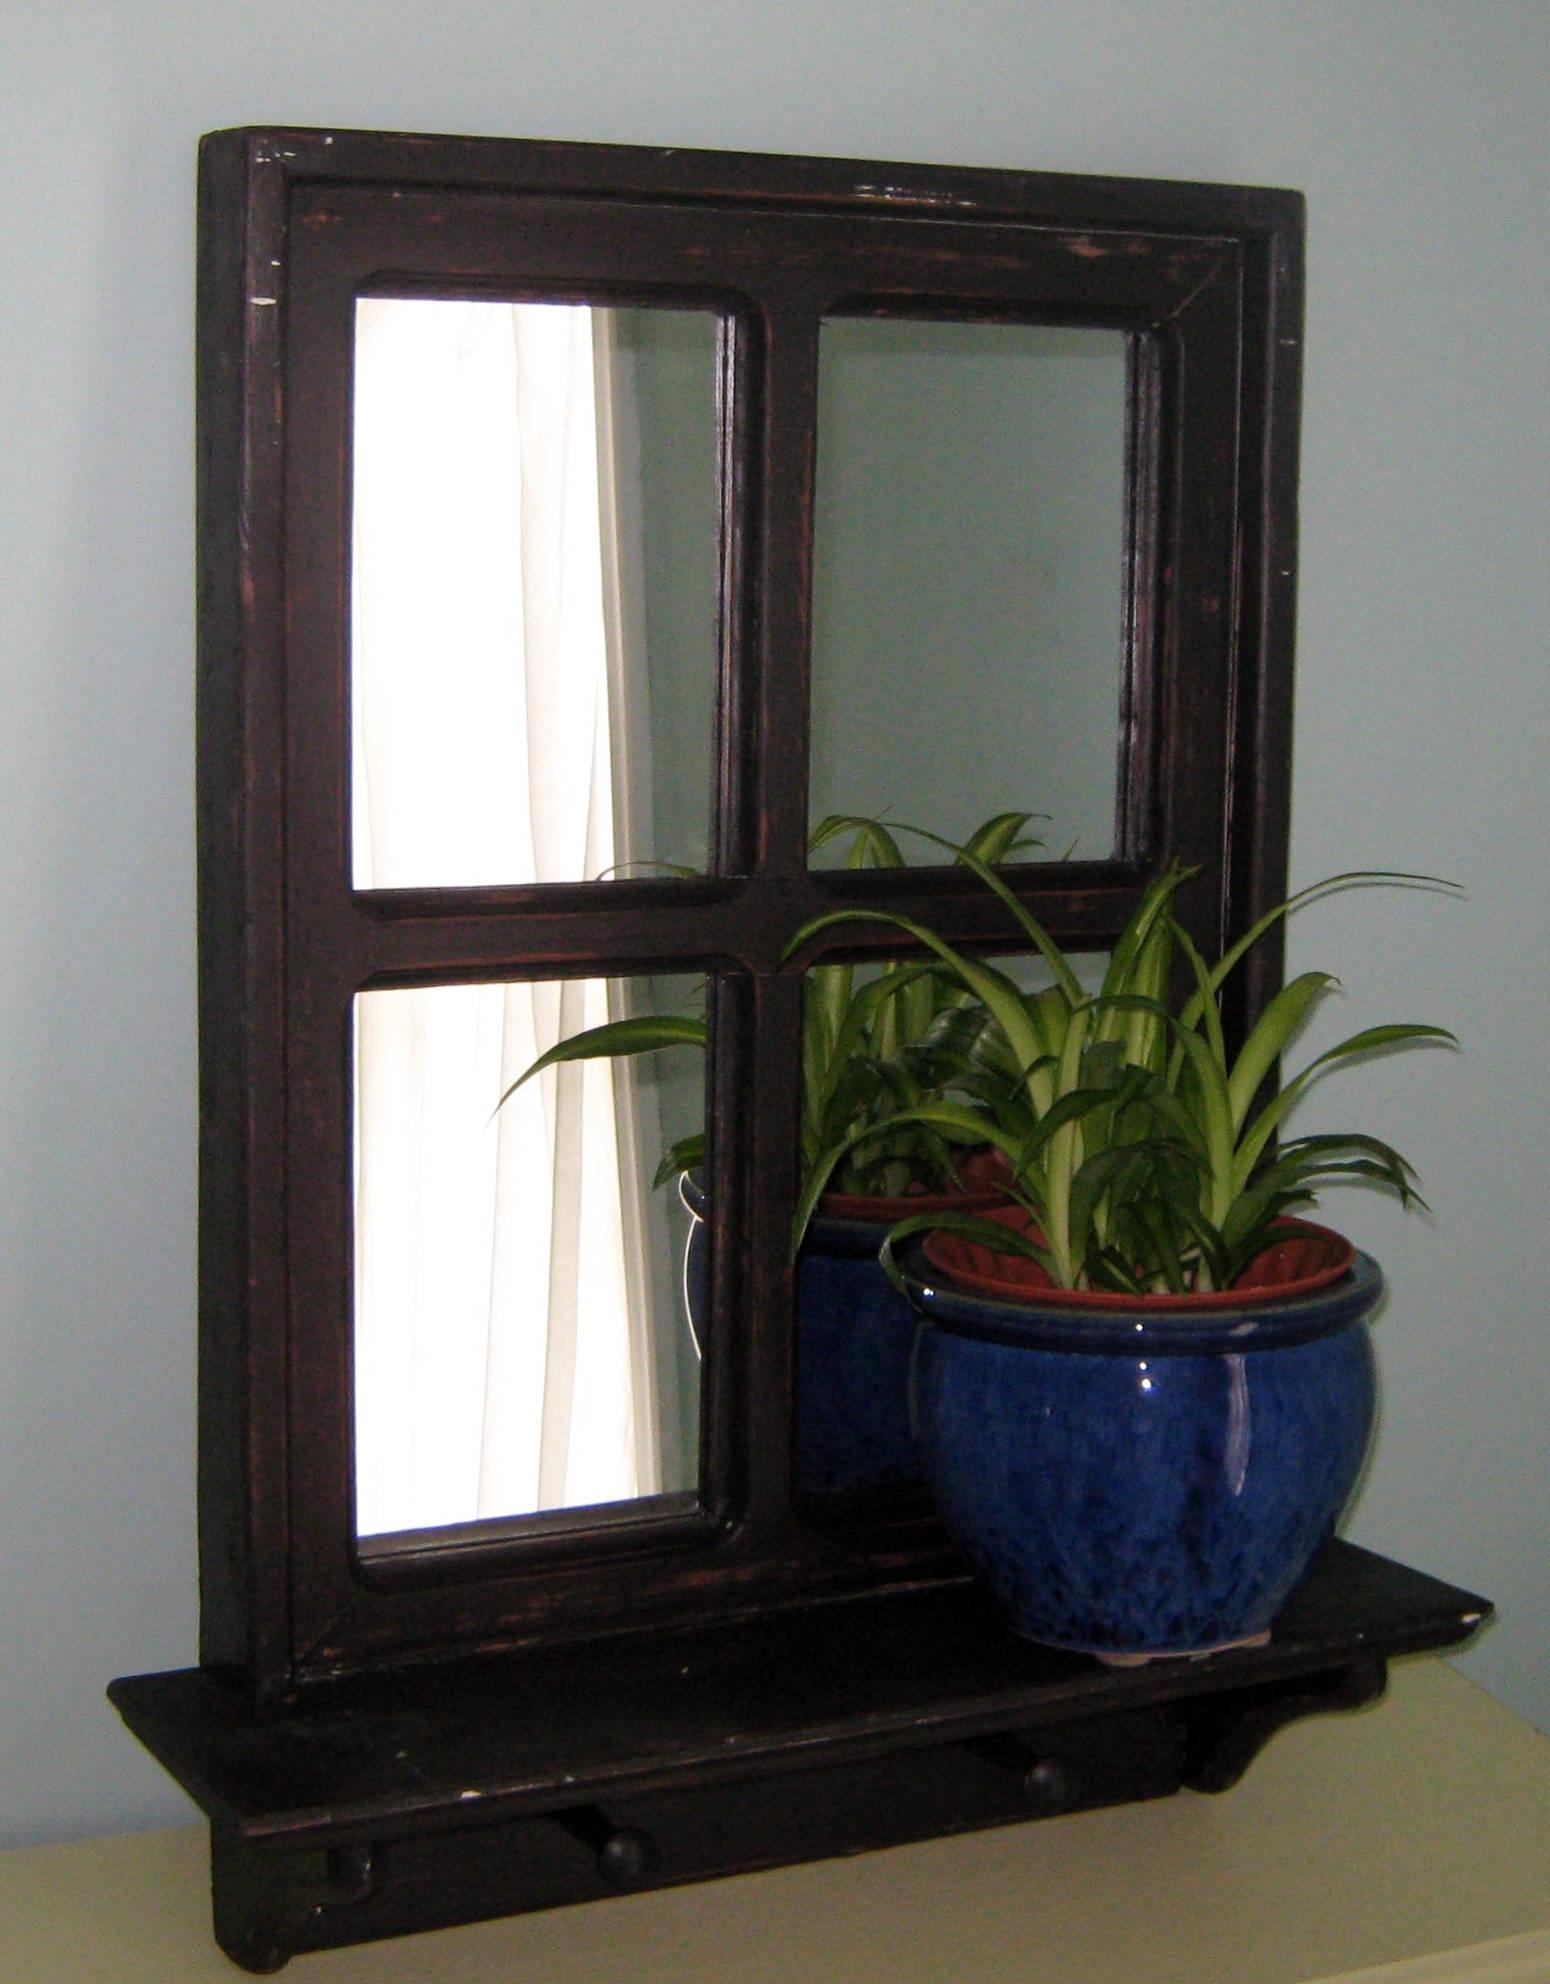 Foyer Mirror Uk : Black entryway mirror decor farmhouse style wall